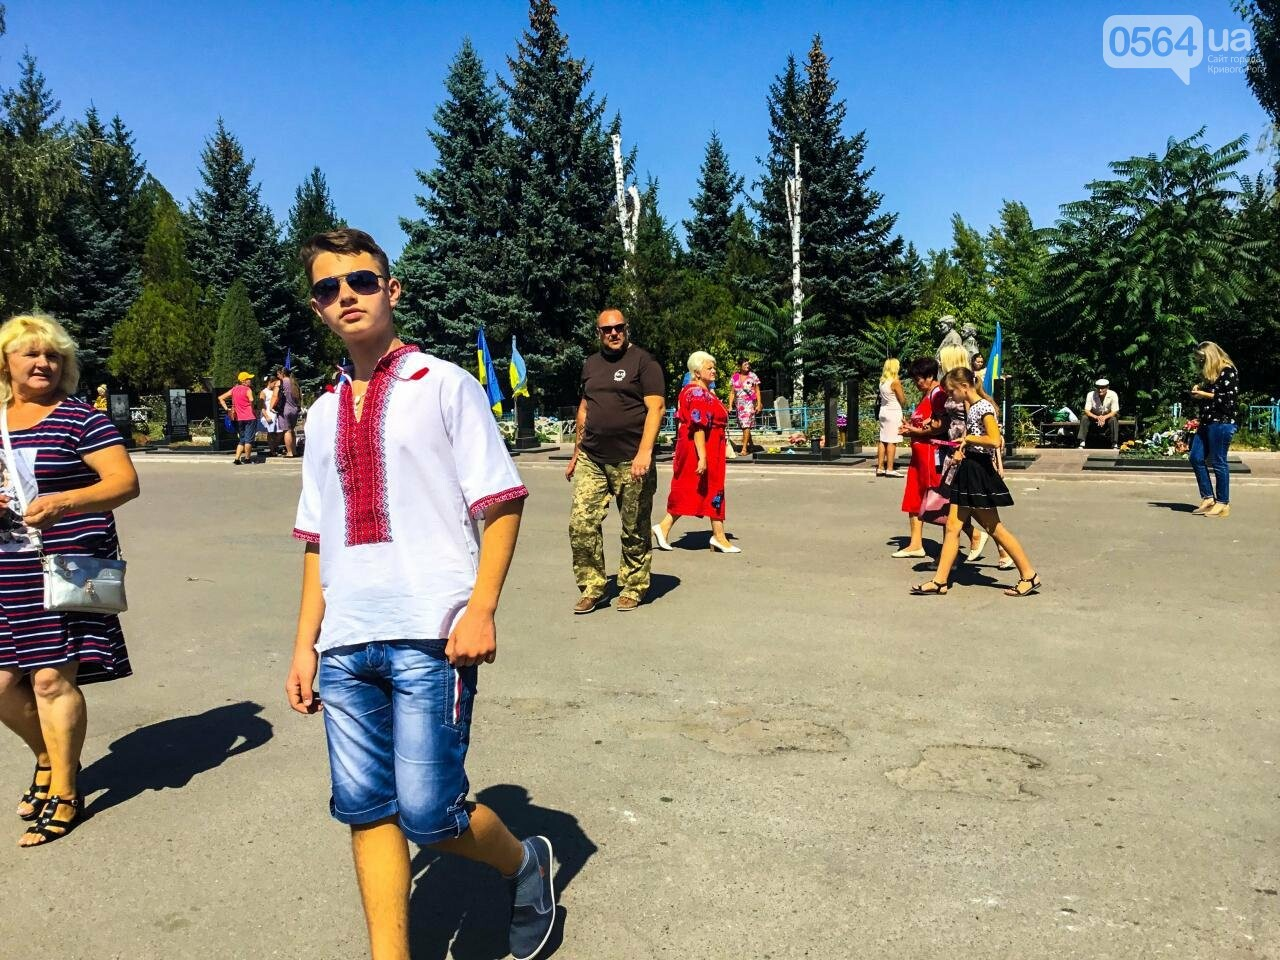 На Аллее Героев провели панихиду по погибшим в зоне АТО криворожанам, - ФОТО , фото-2